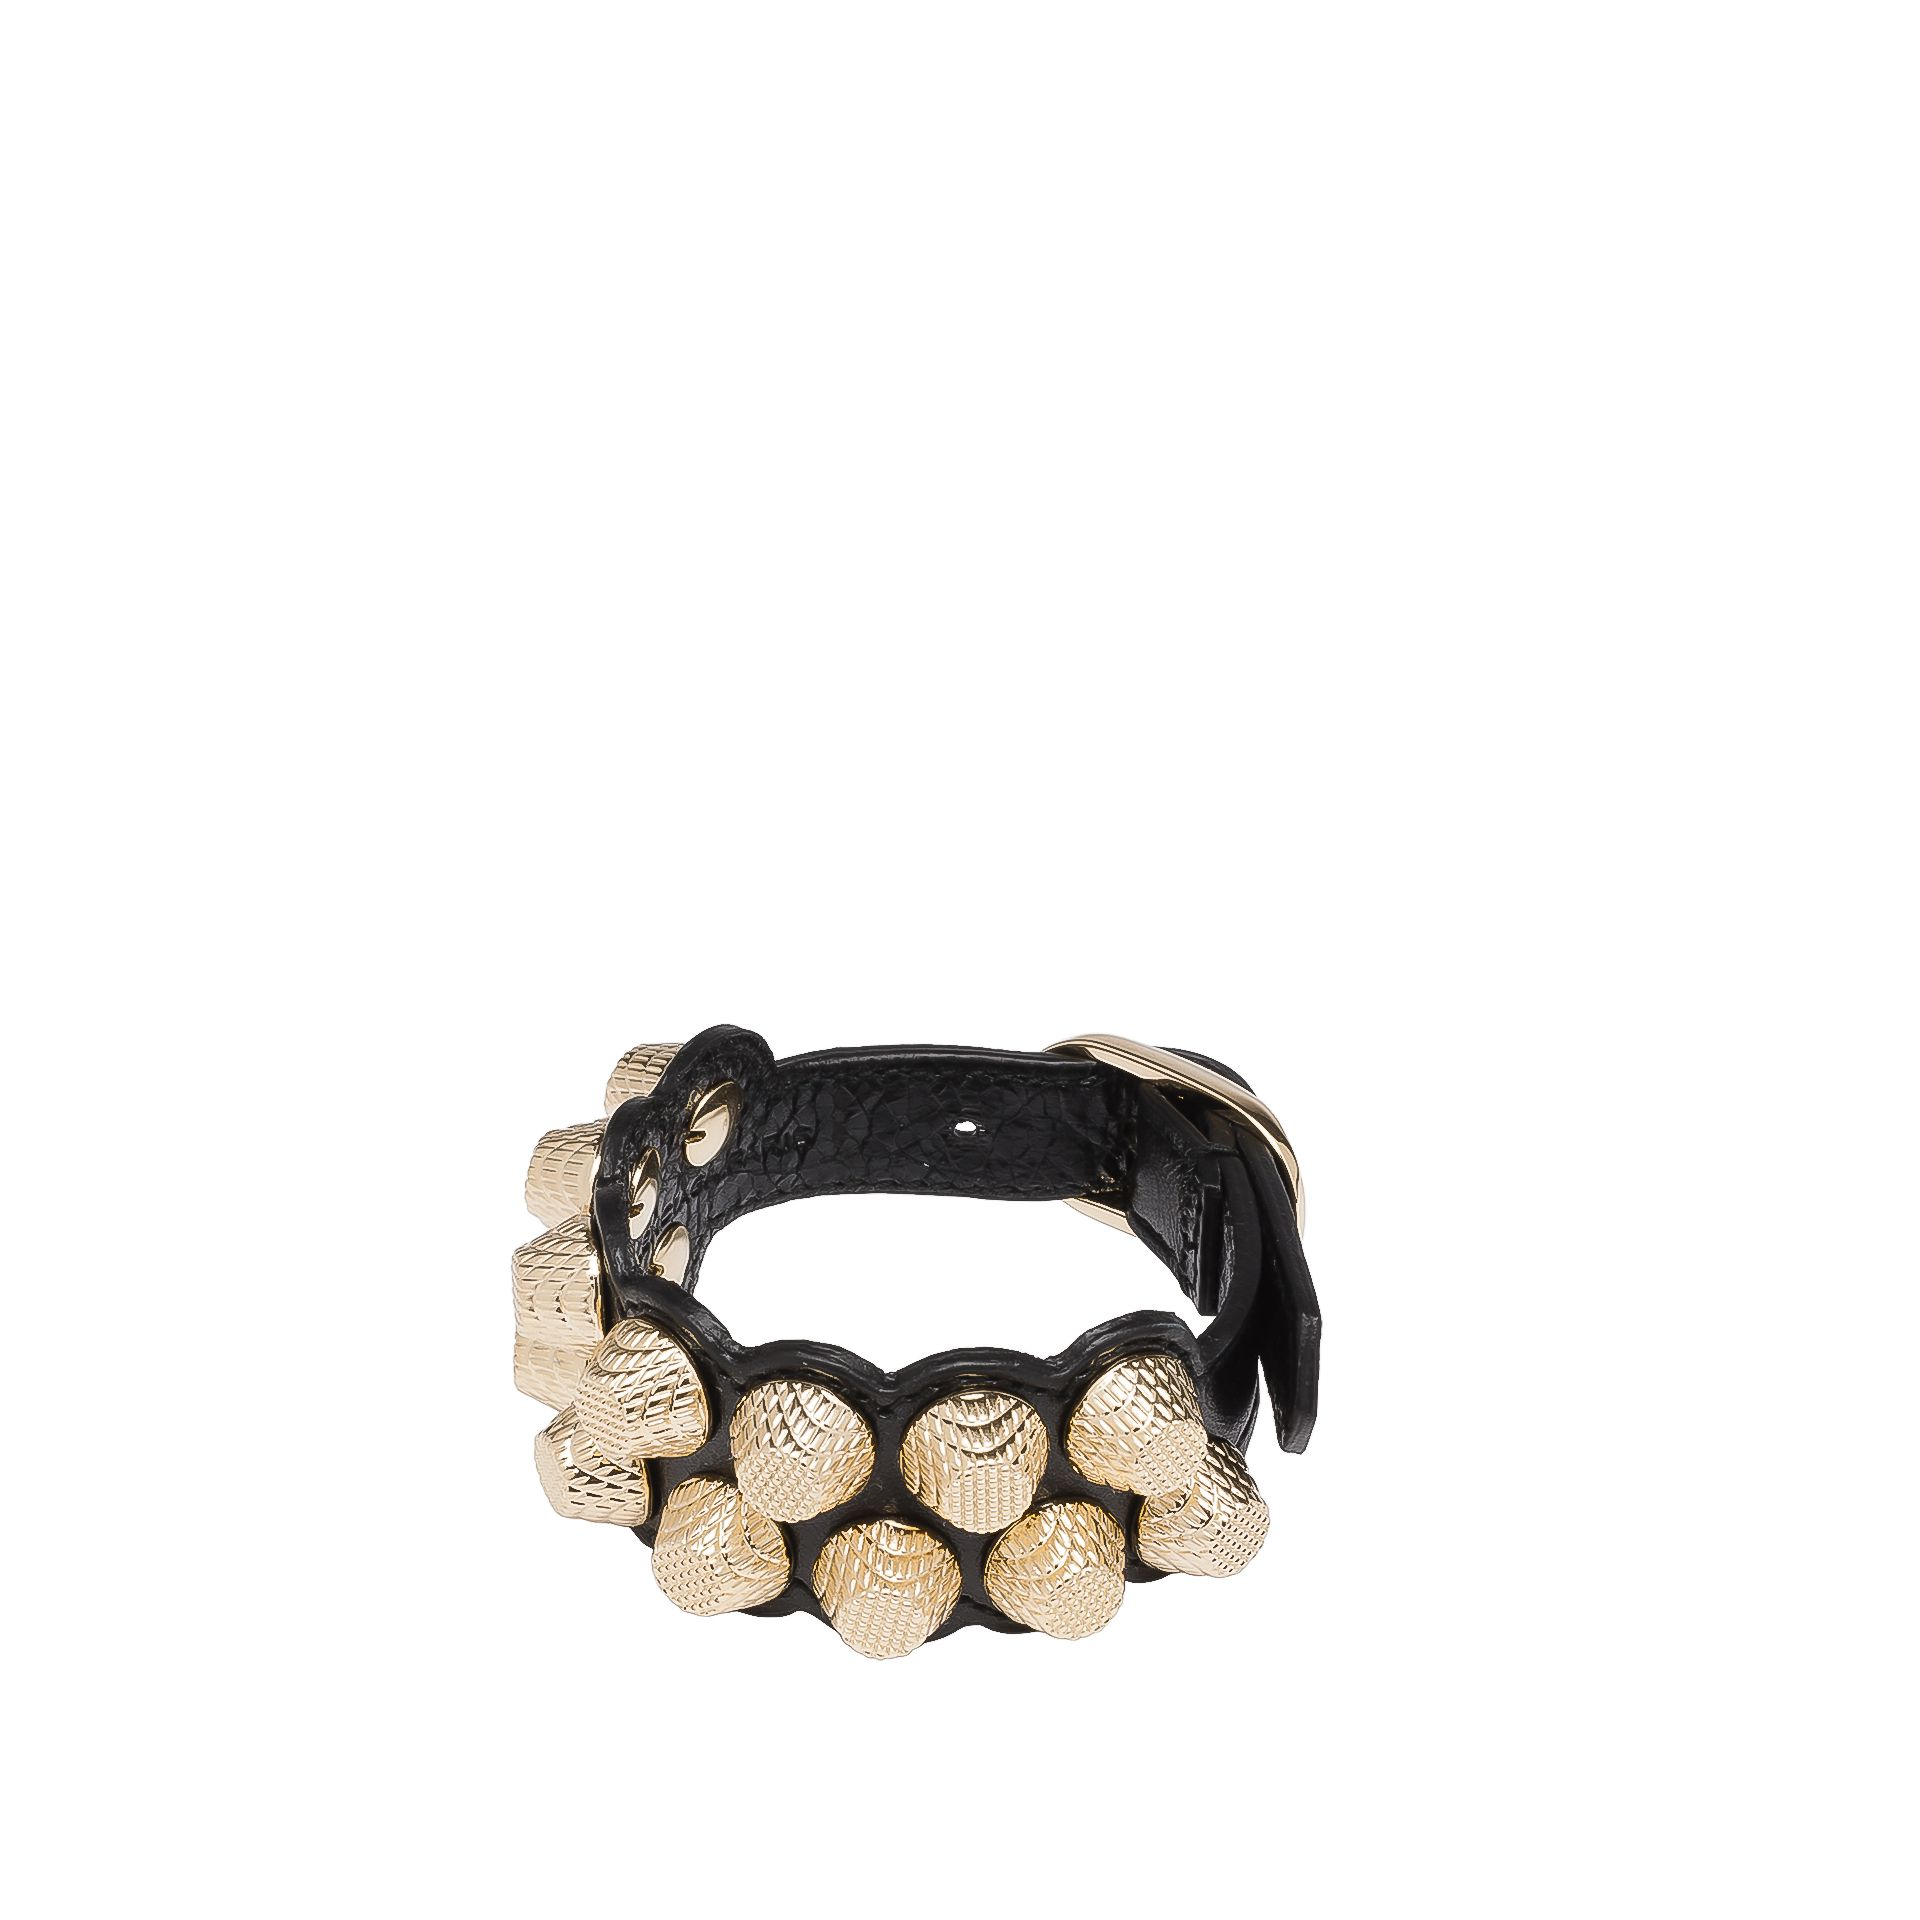 BALENCIAGA Balenciaga Giant Gold Bracelet Stud M Bracelet D f